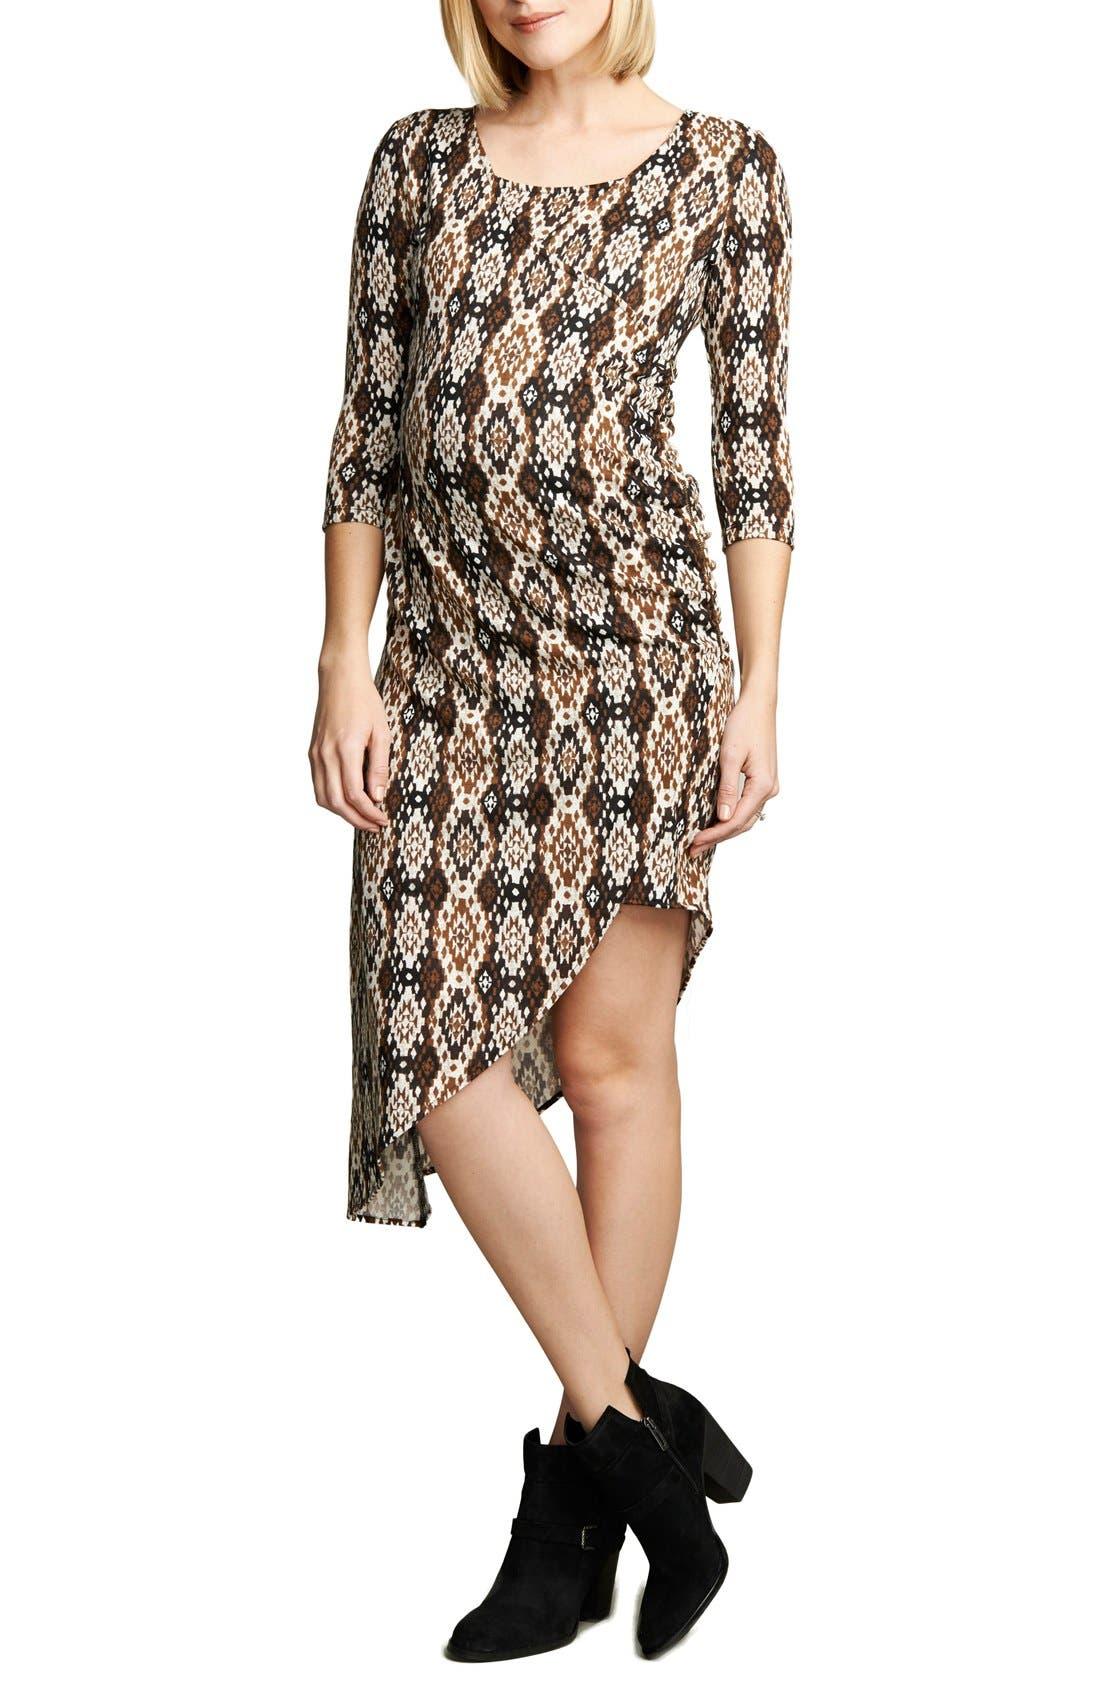 Alternate Image 1 Selected - Maternal America Print Asymmetrical Hem Dress